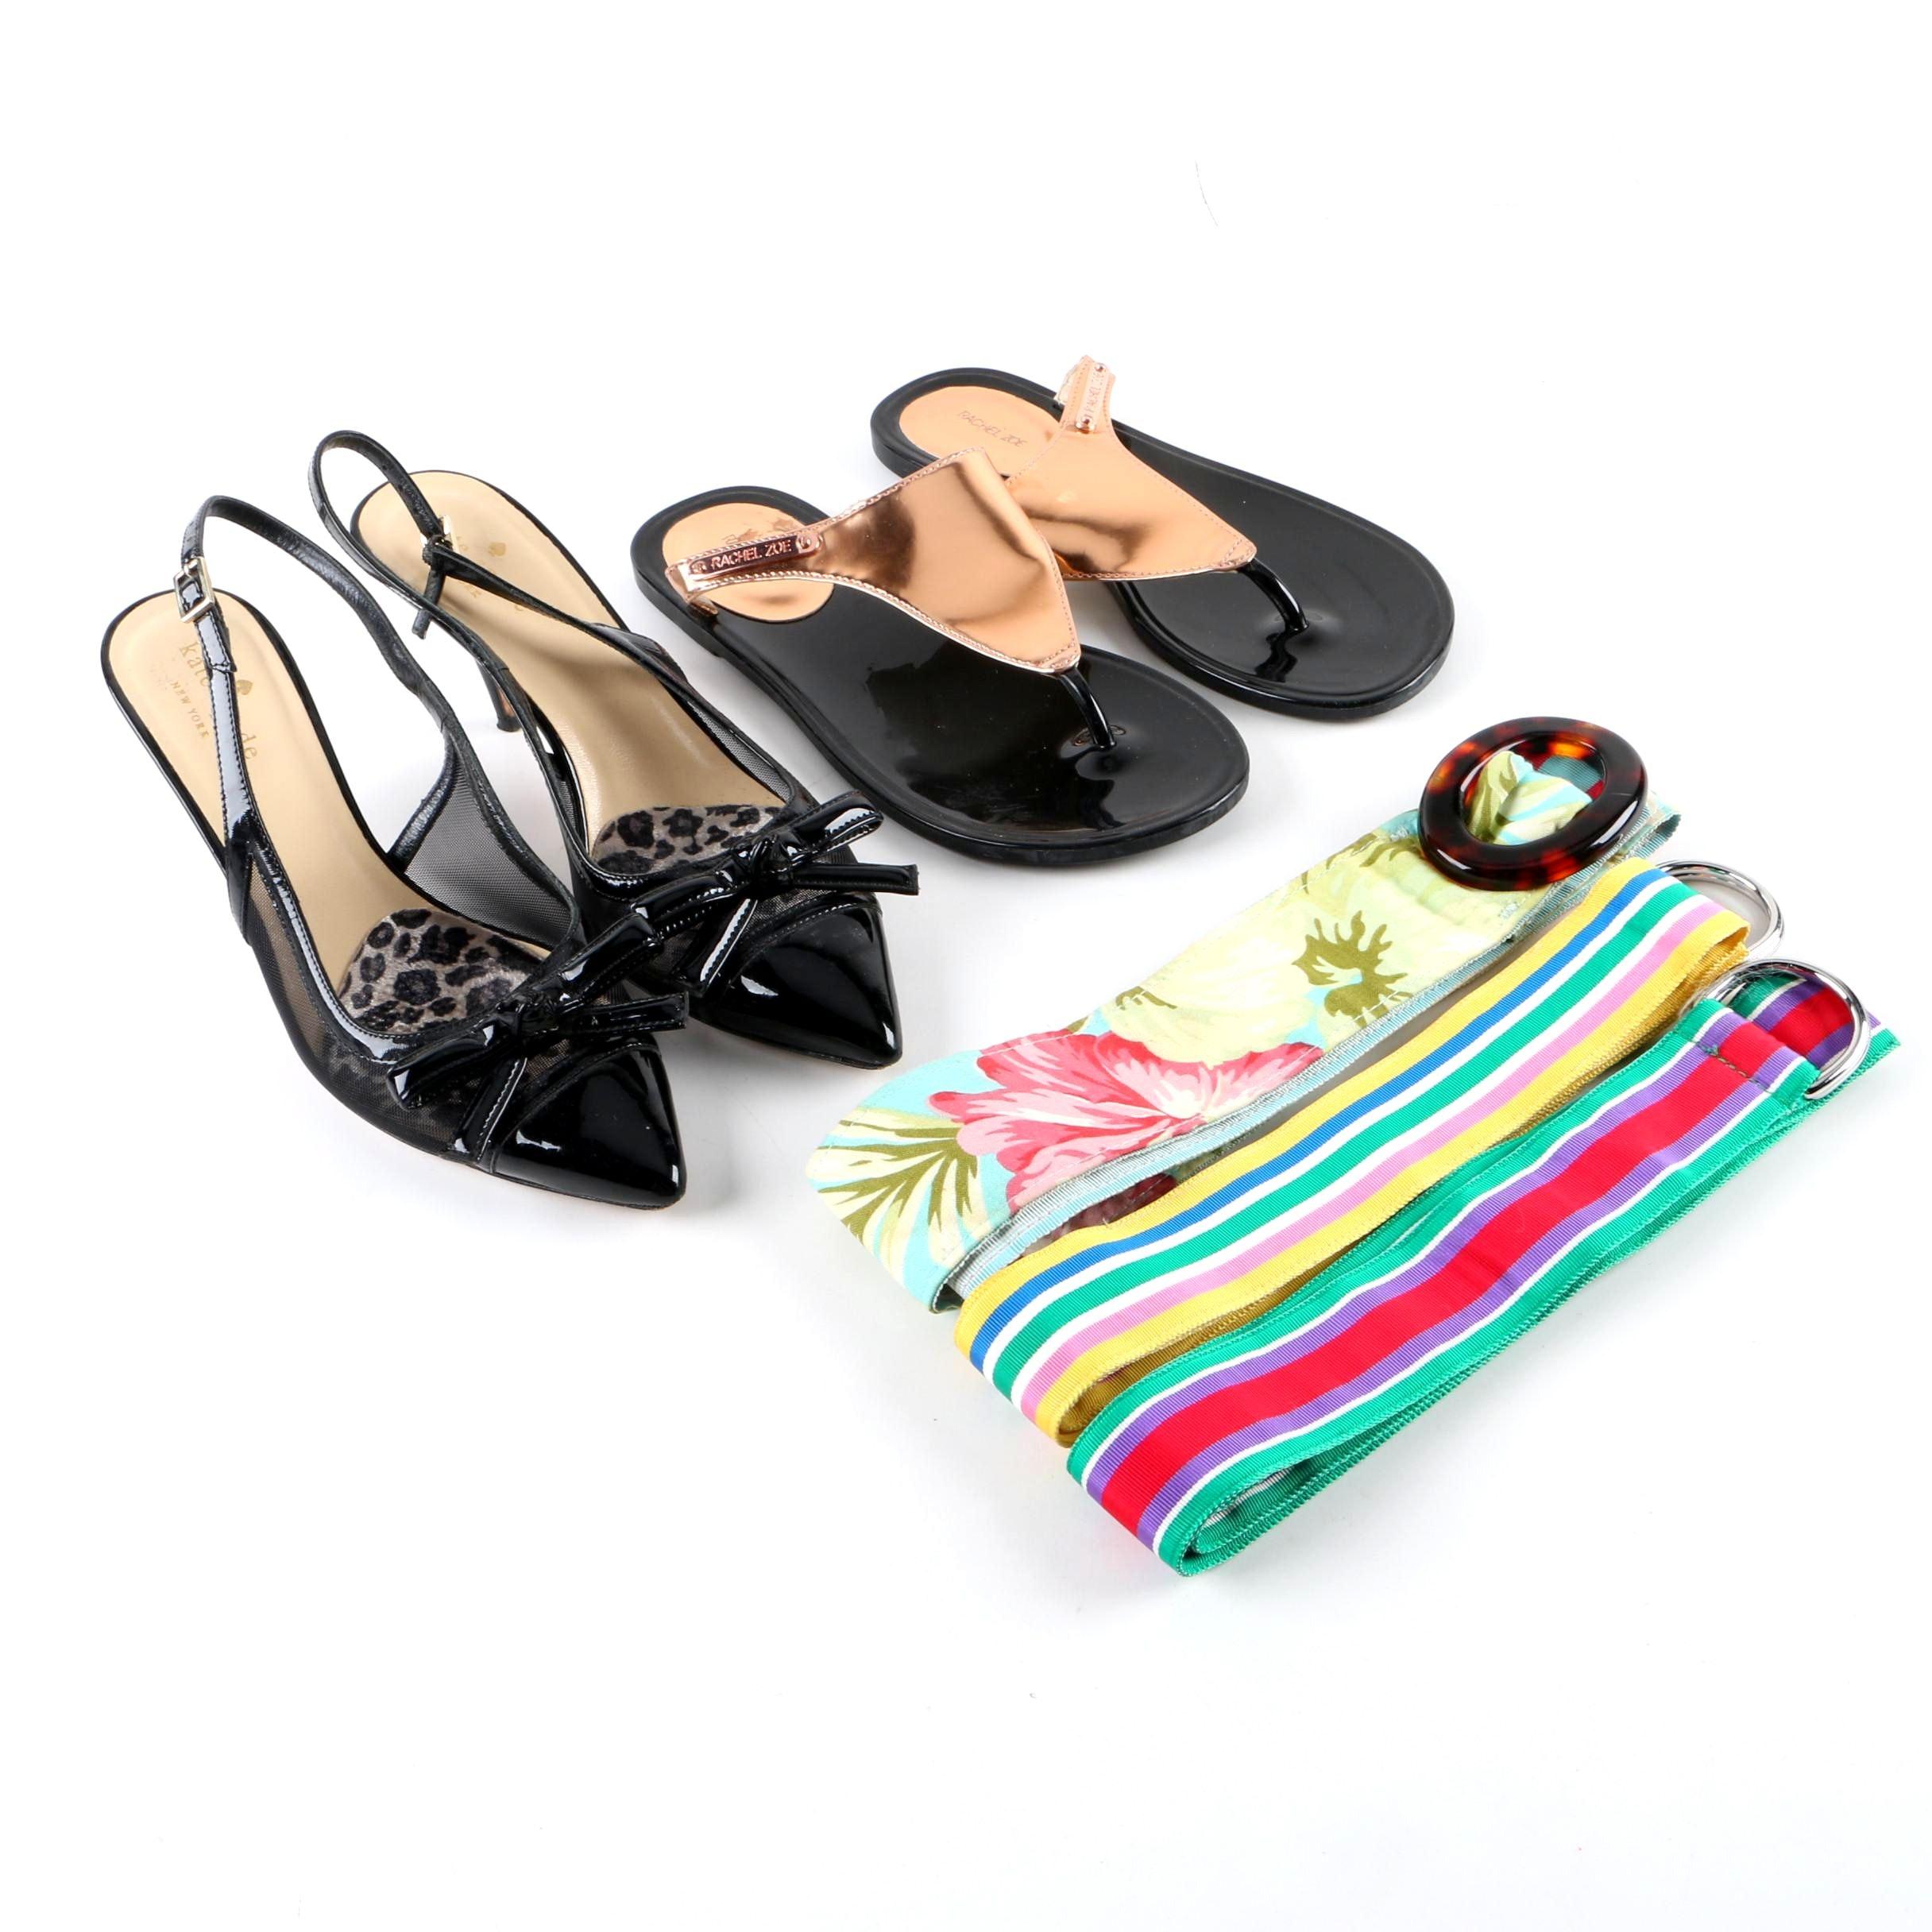 Kate Spade New York Slingback Heels, Rachel Zoe Thong Sandals and Assorted Belts